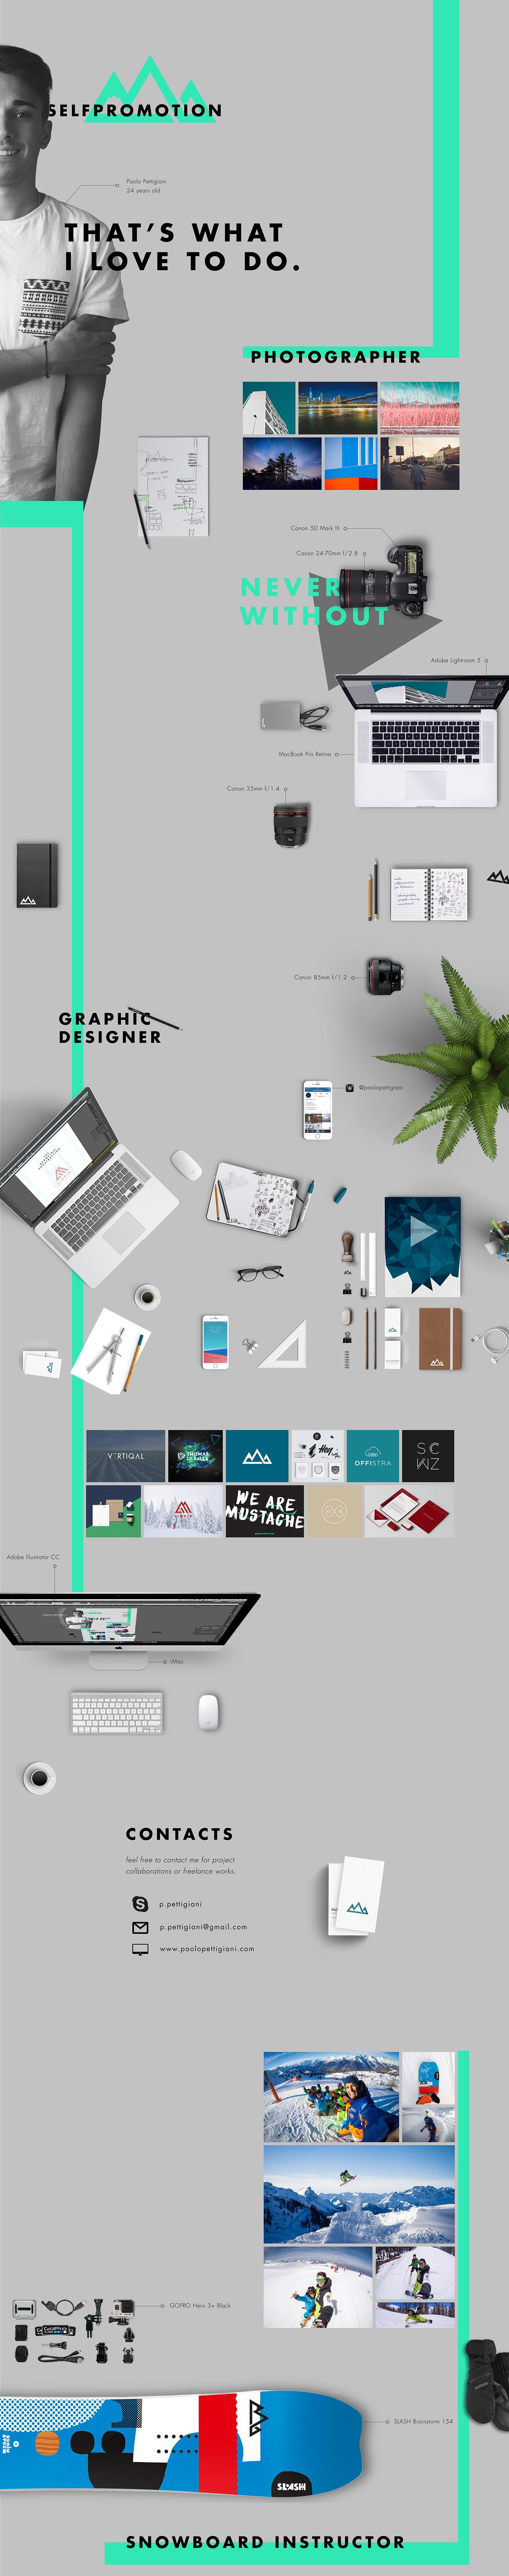 selfpromotion self Promotion free CV Resume template curriculum Vitae freebie creative minimal graphic Layout download